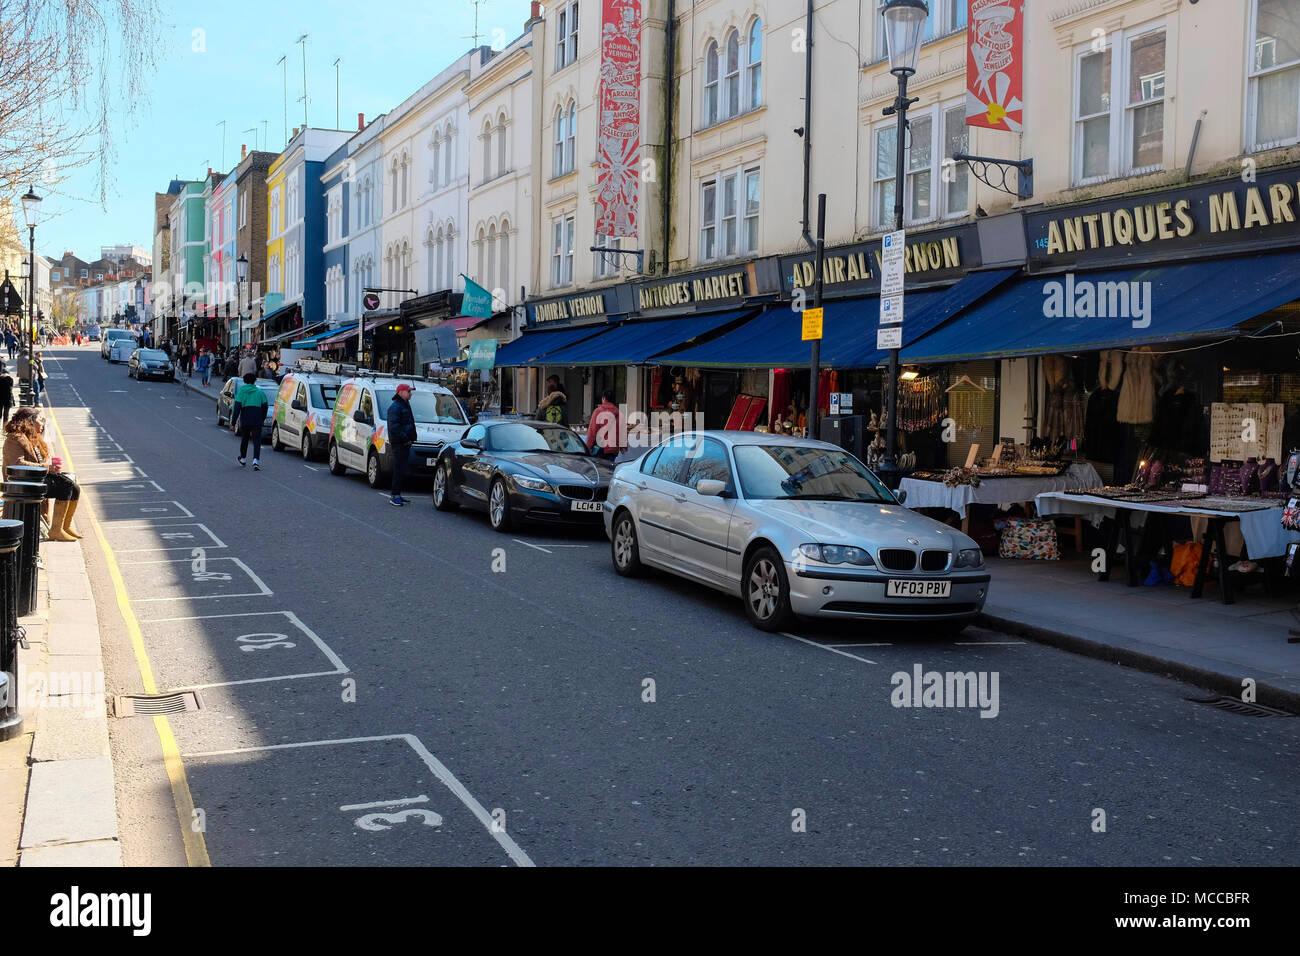 Portobello Road, Notting Hill, London, England, UK. - Stock Image